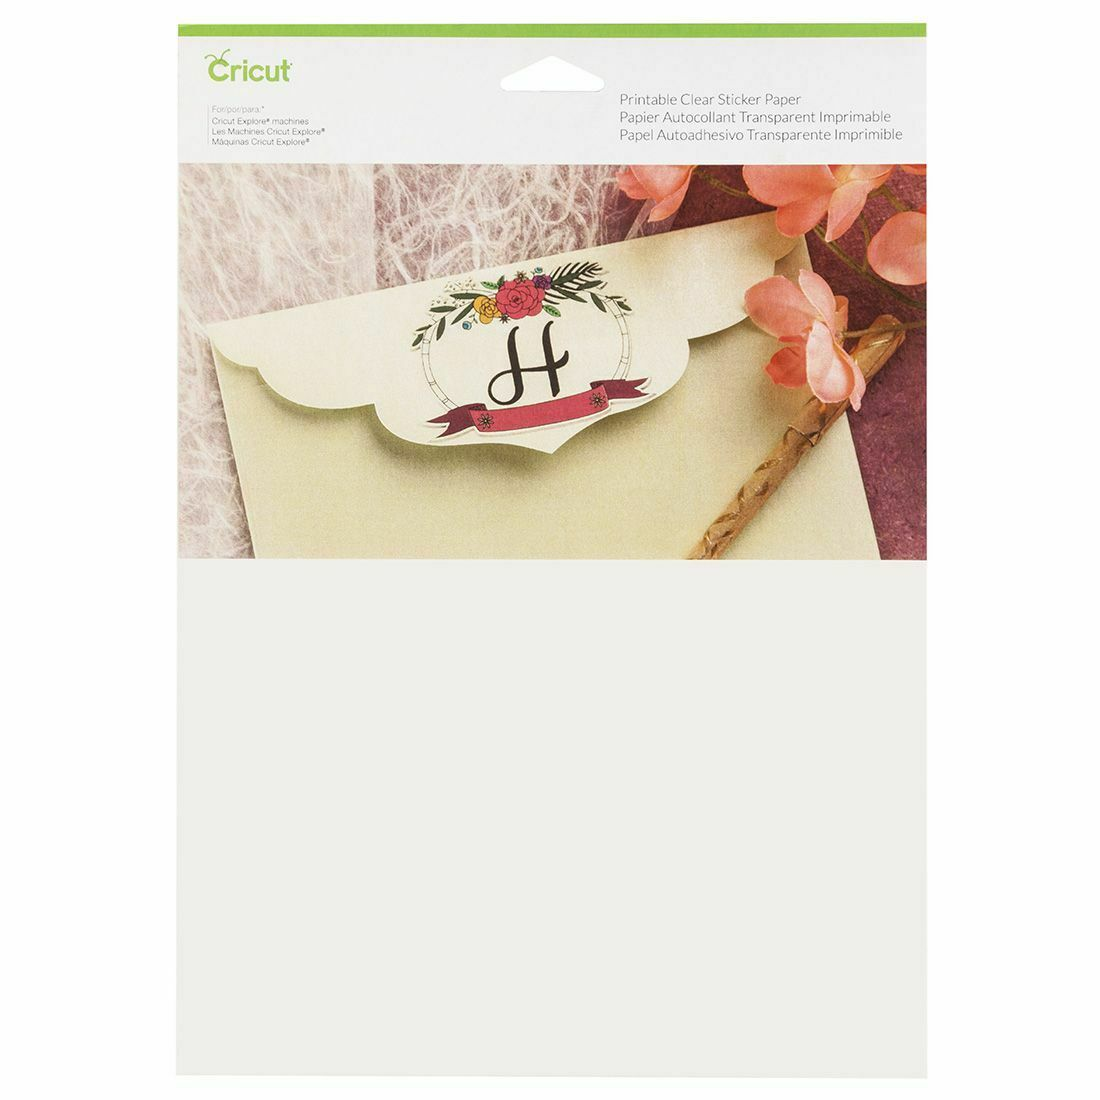 New Cricut Printable Sticker Paper Clear